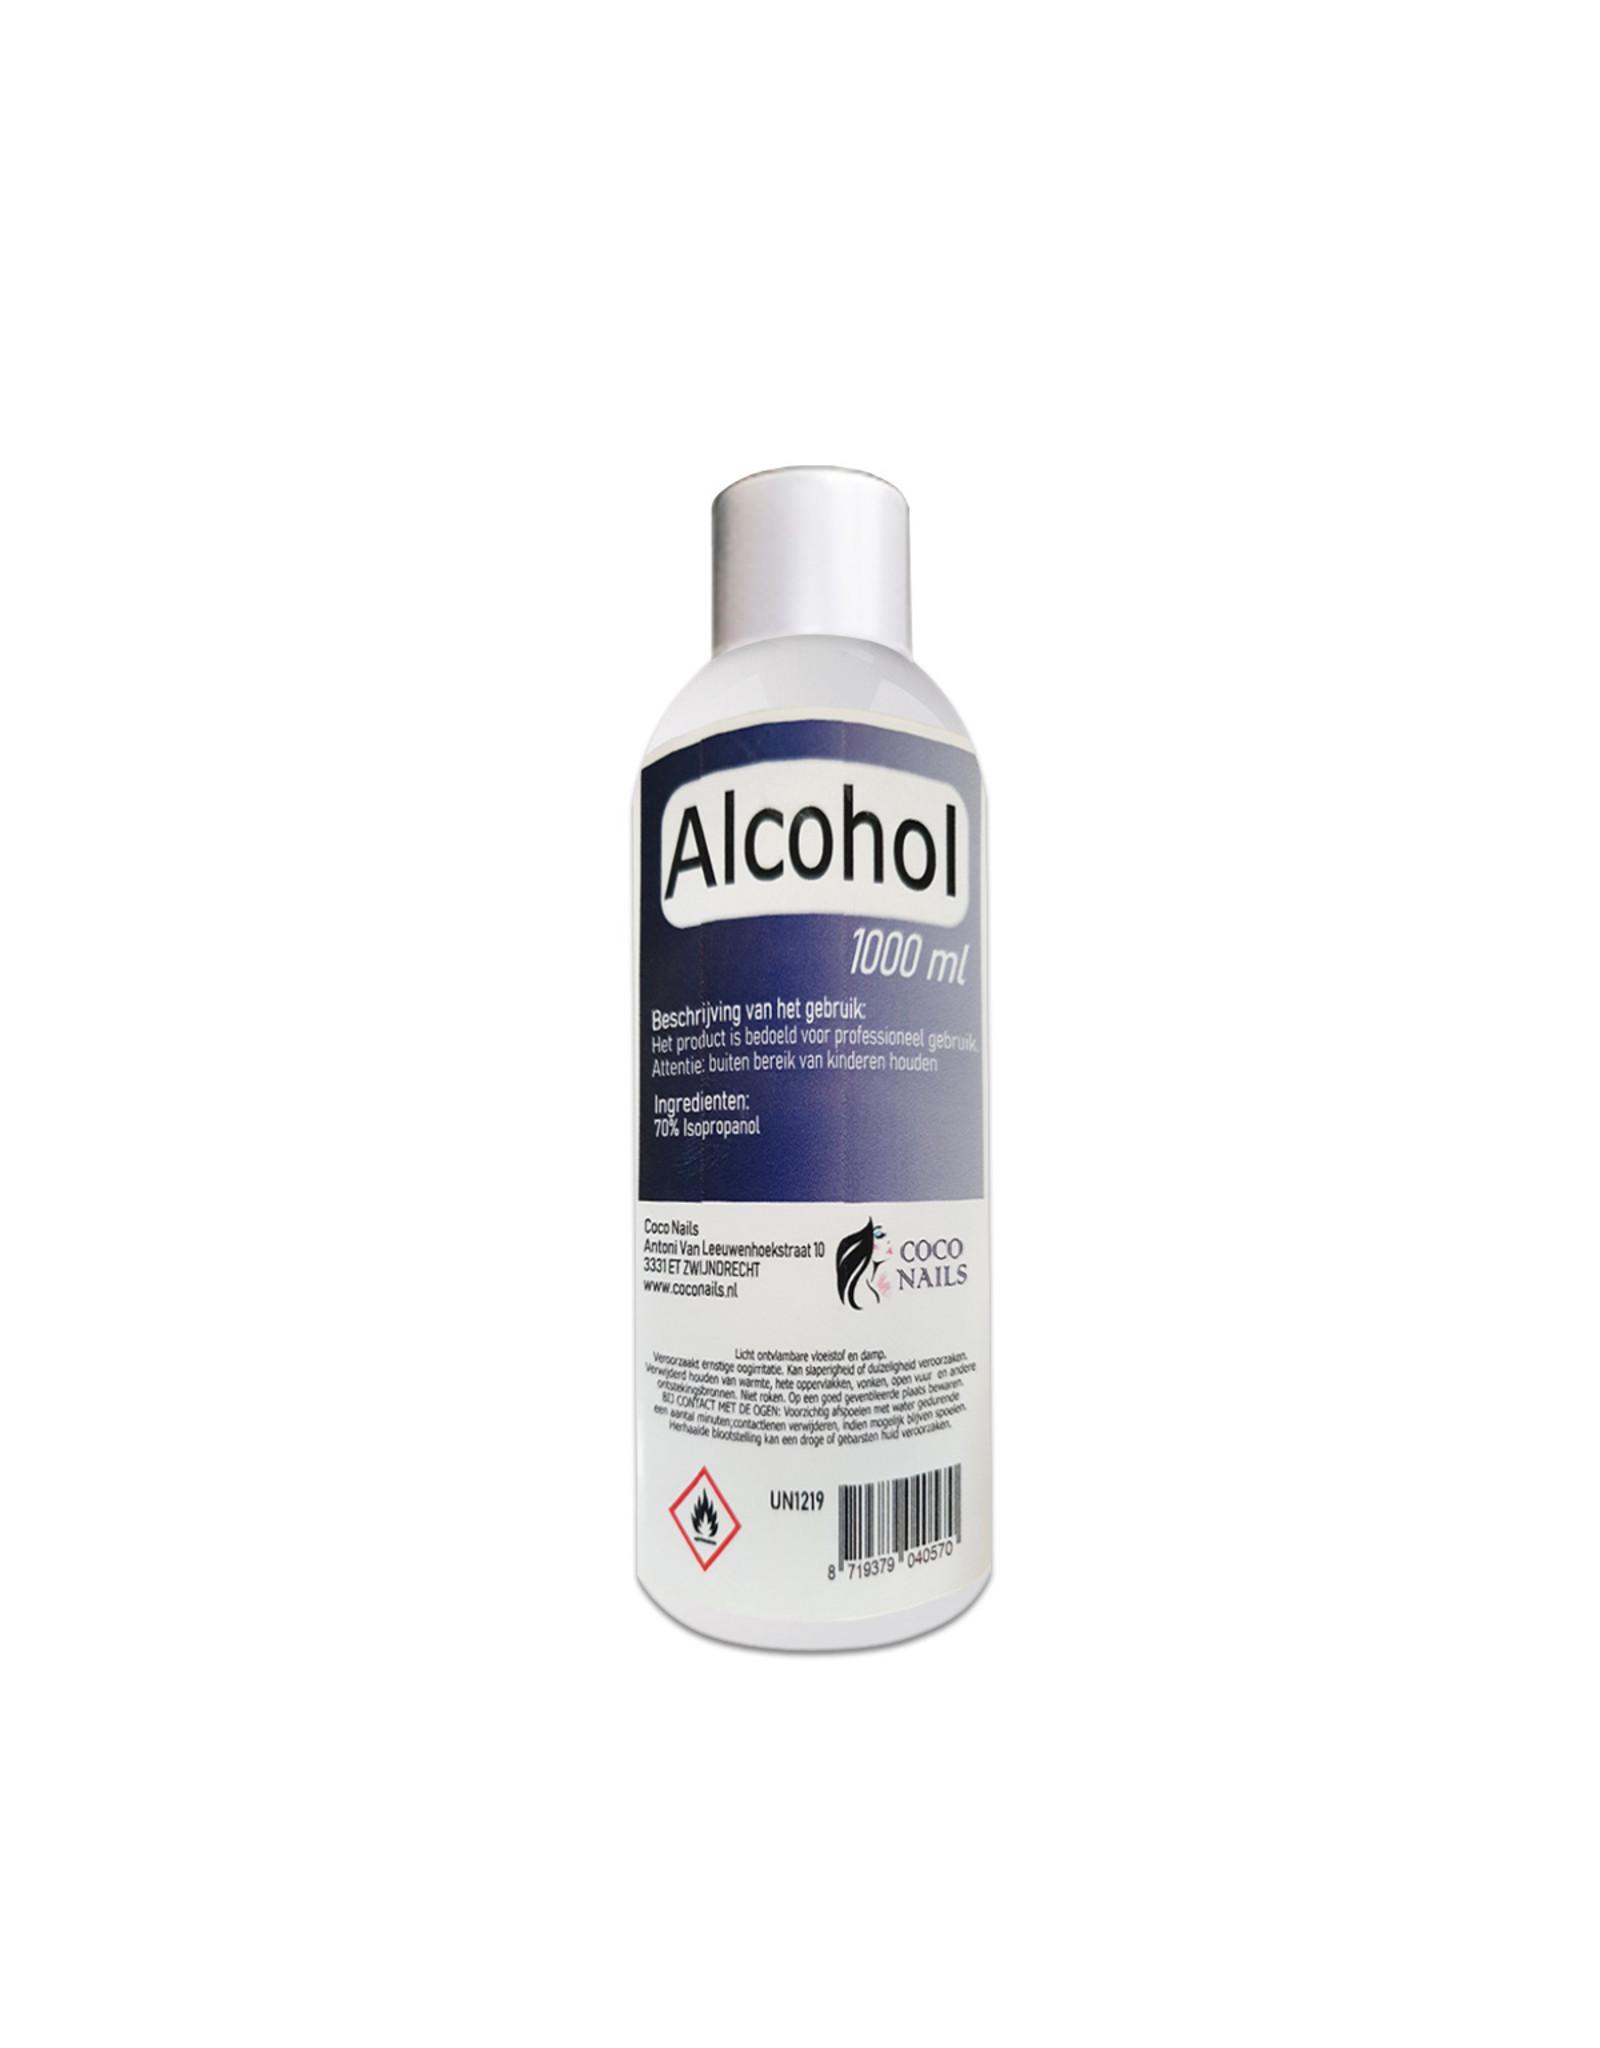 Coconails Alcohol 70% 1000 ml/Desinfectiemiddel